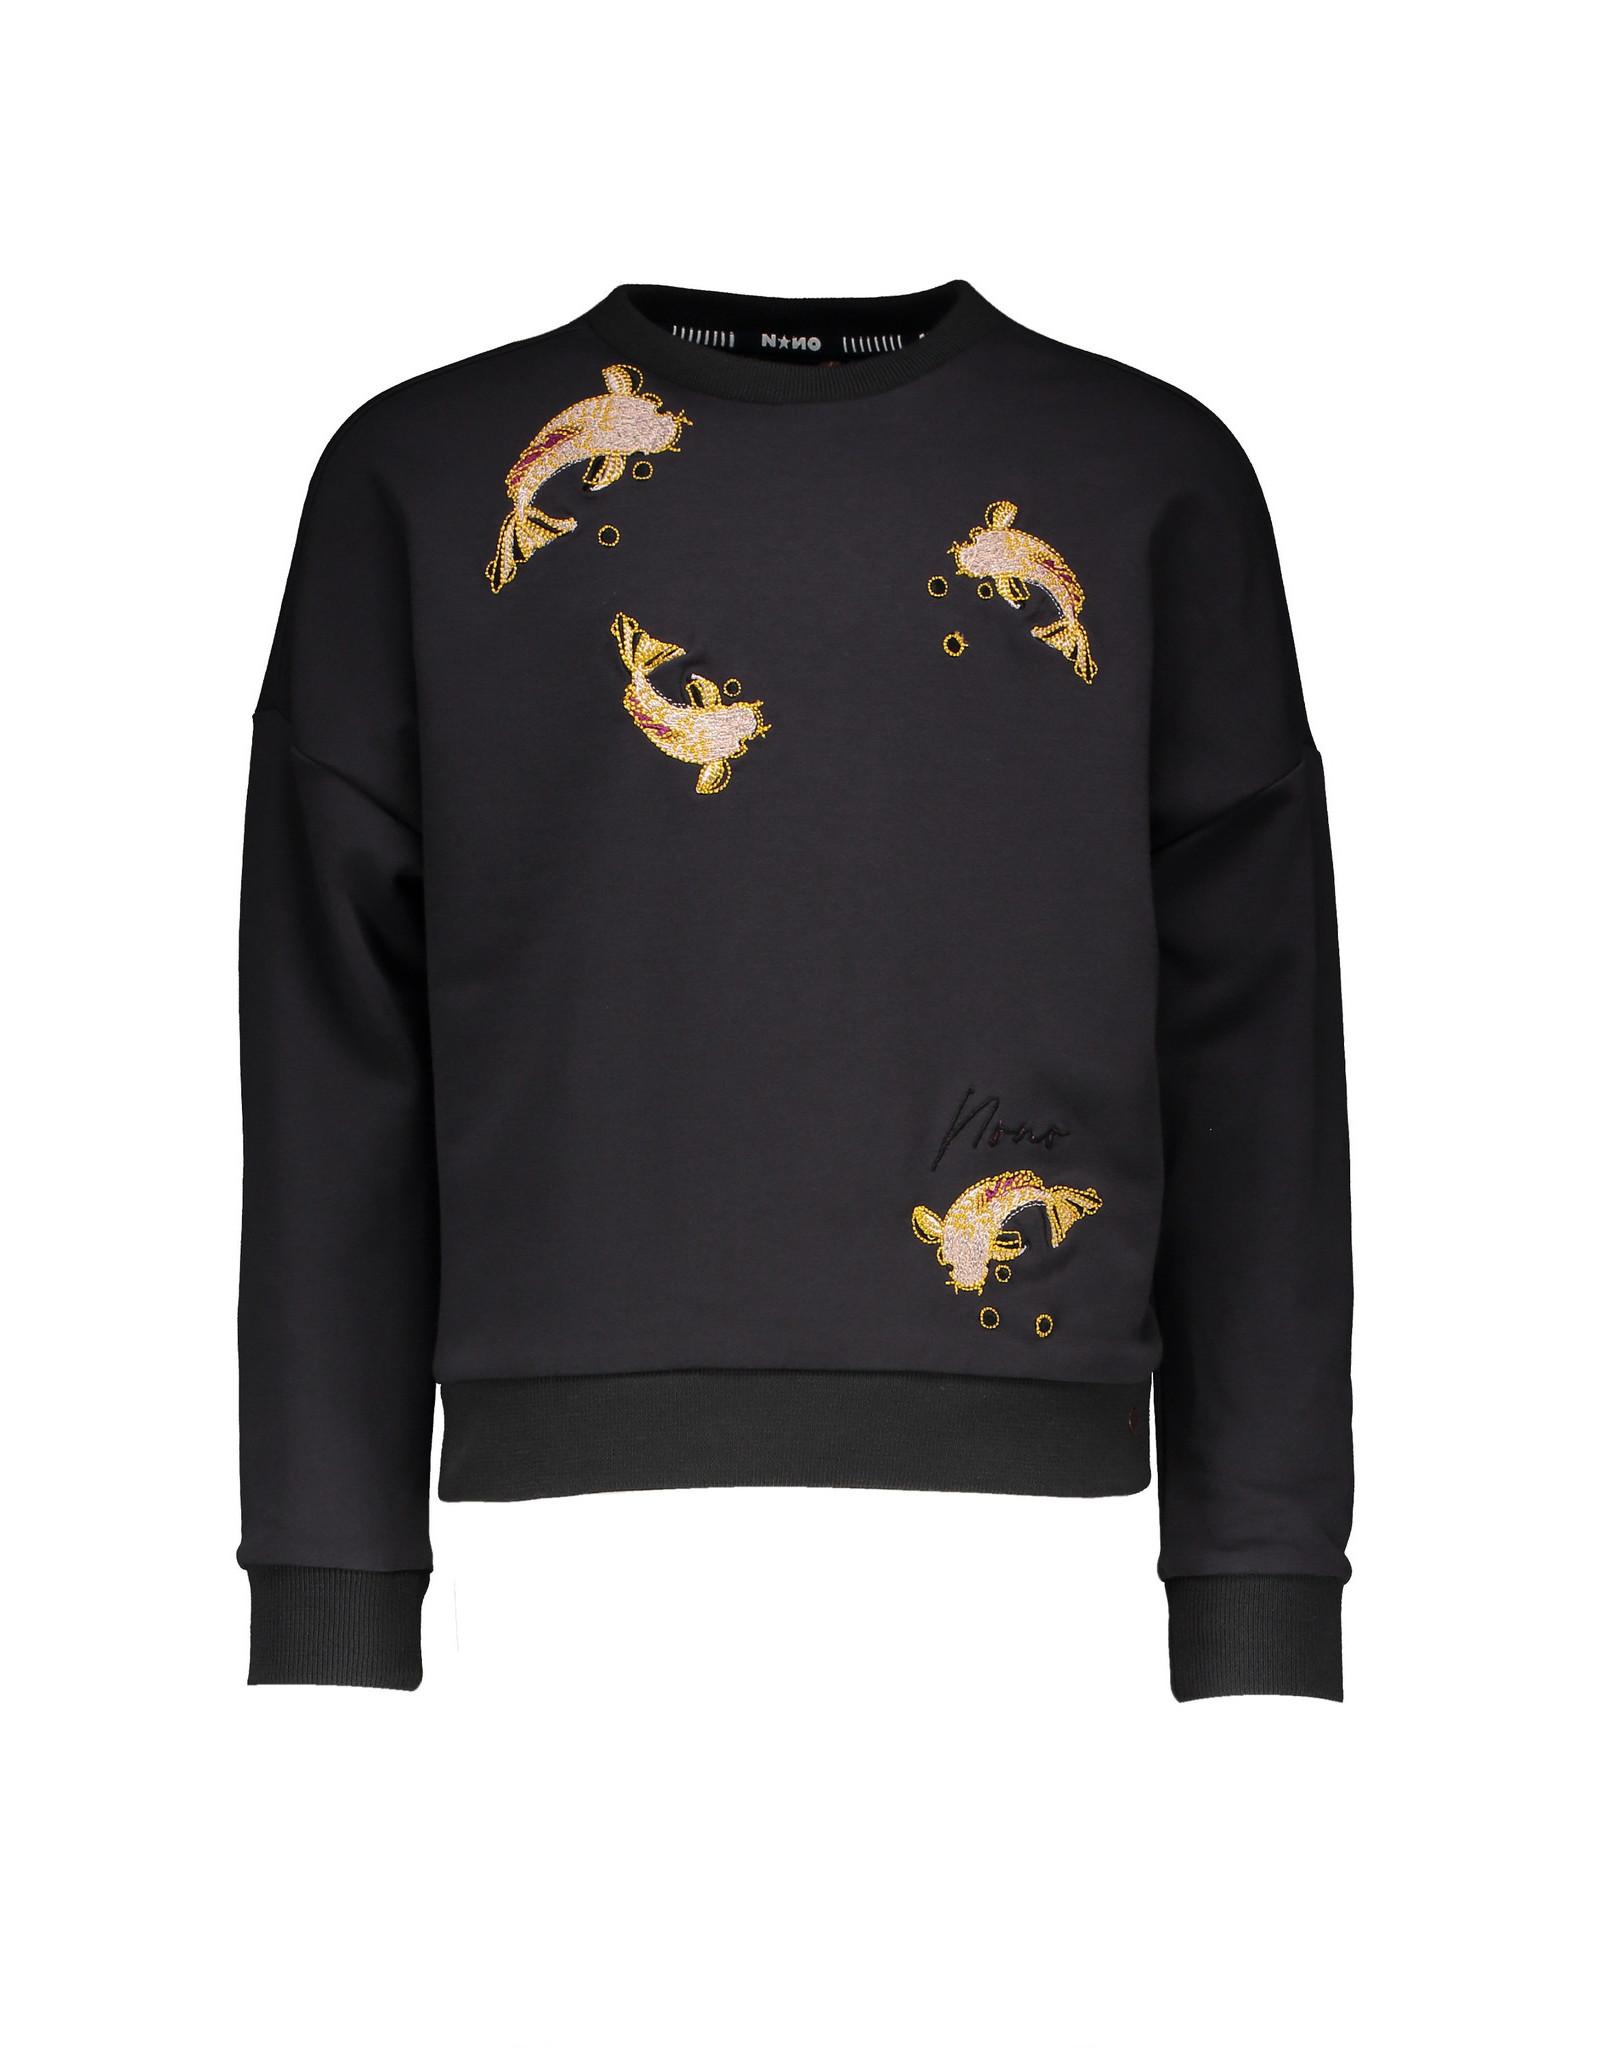 Nono NONO sweater 5306 phantom